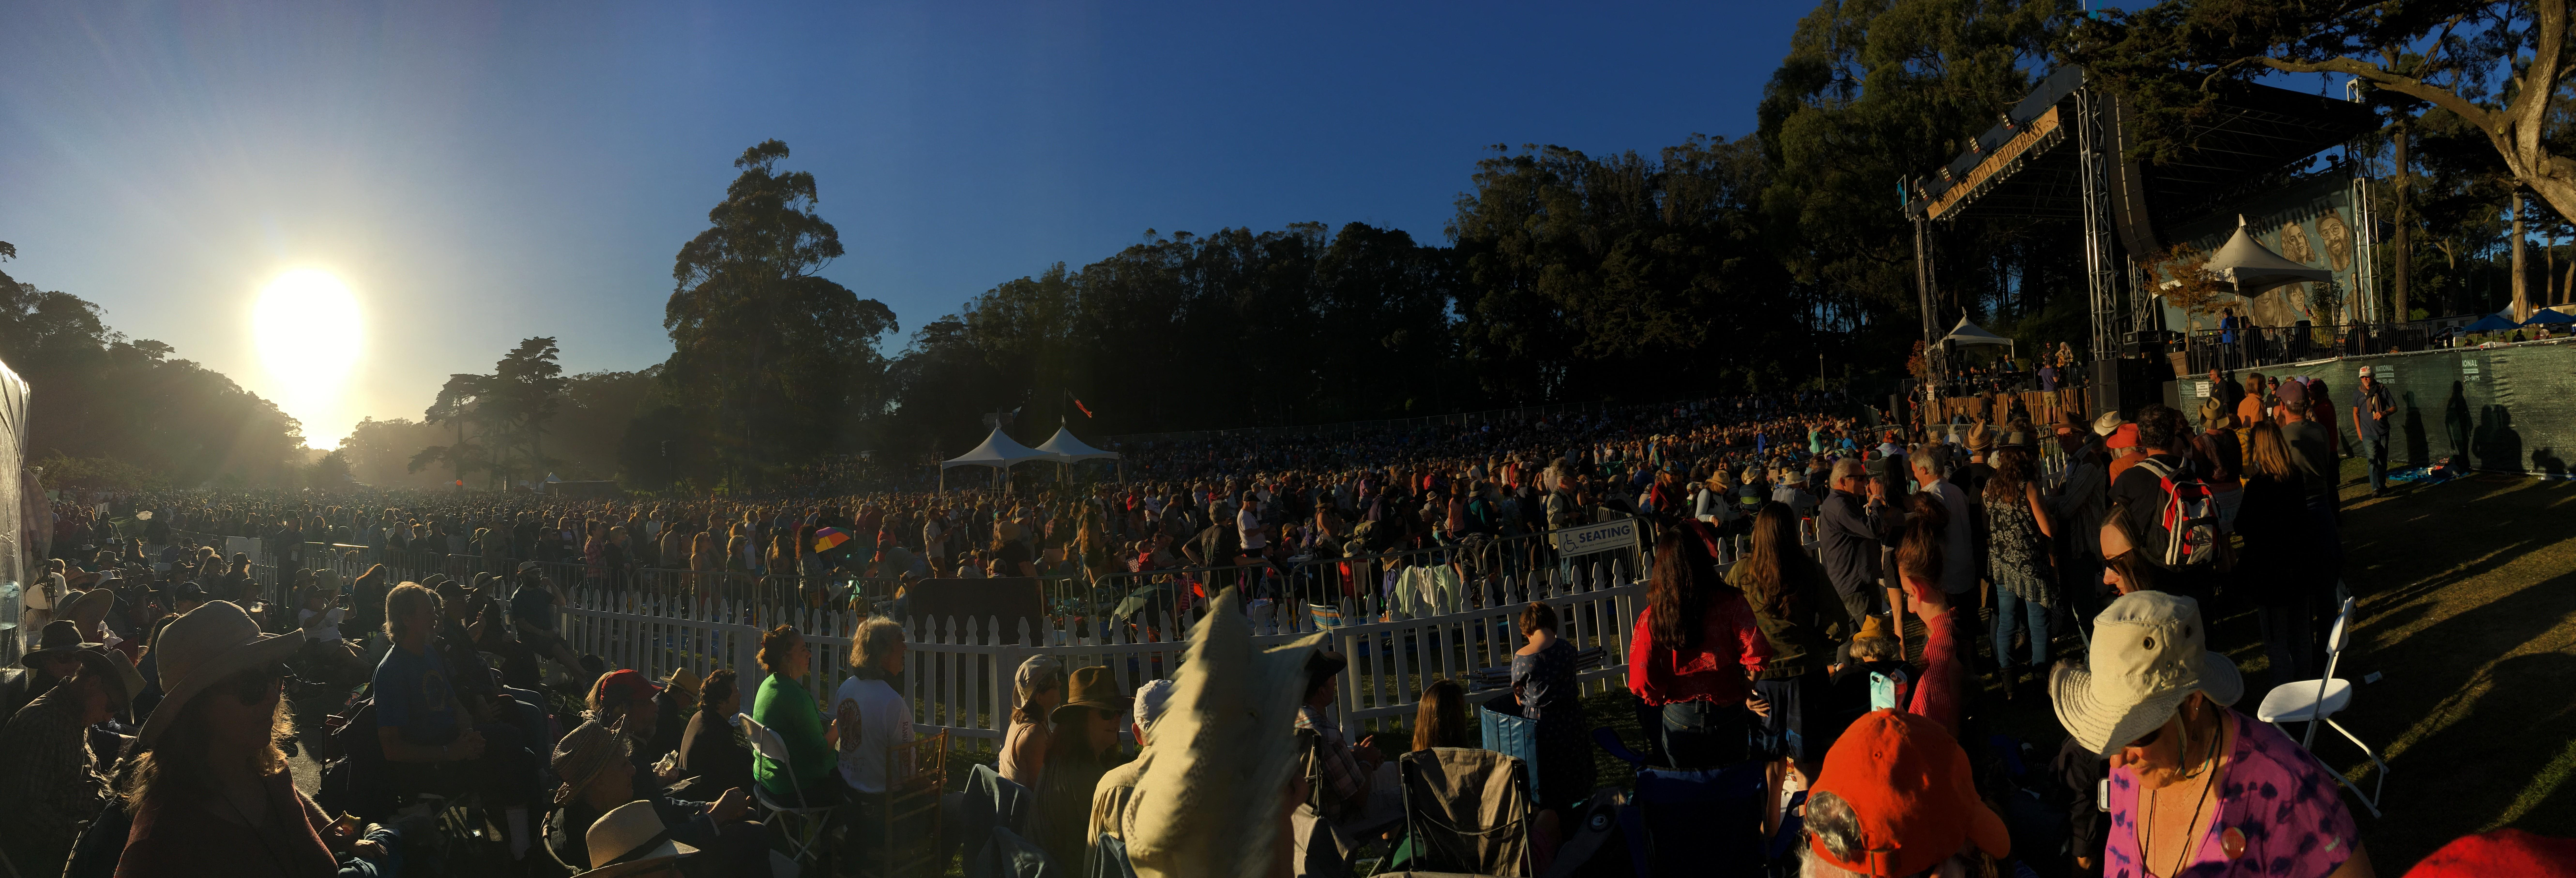 Crowd for Emmylou Harris